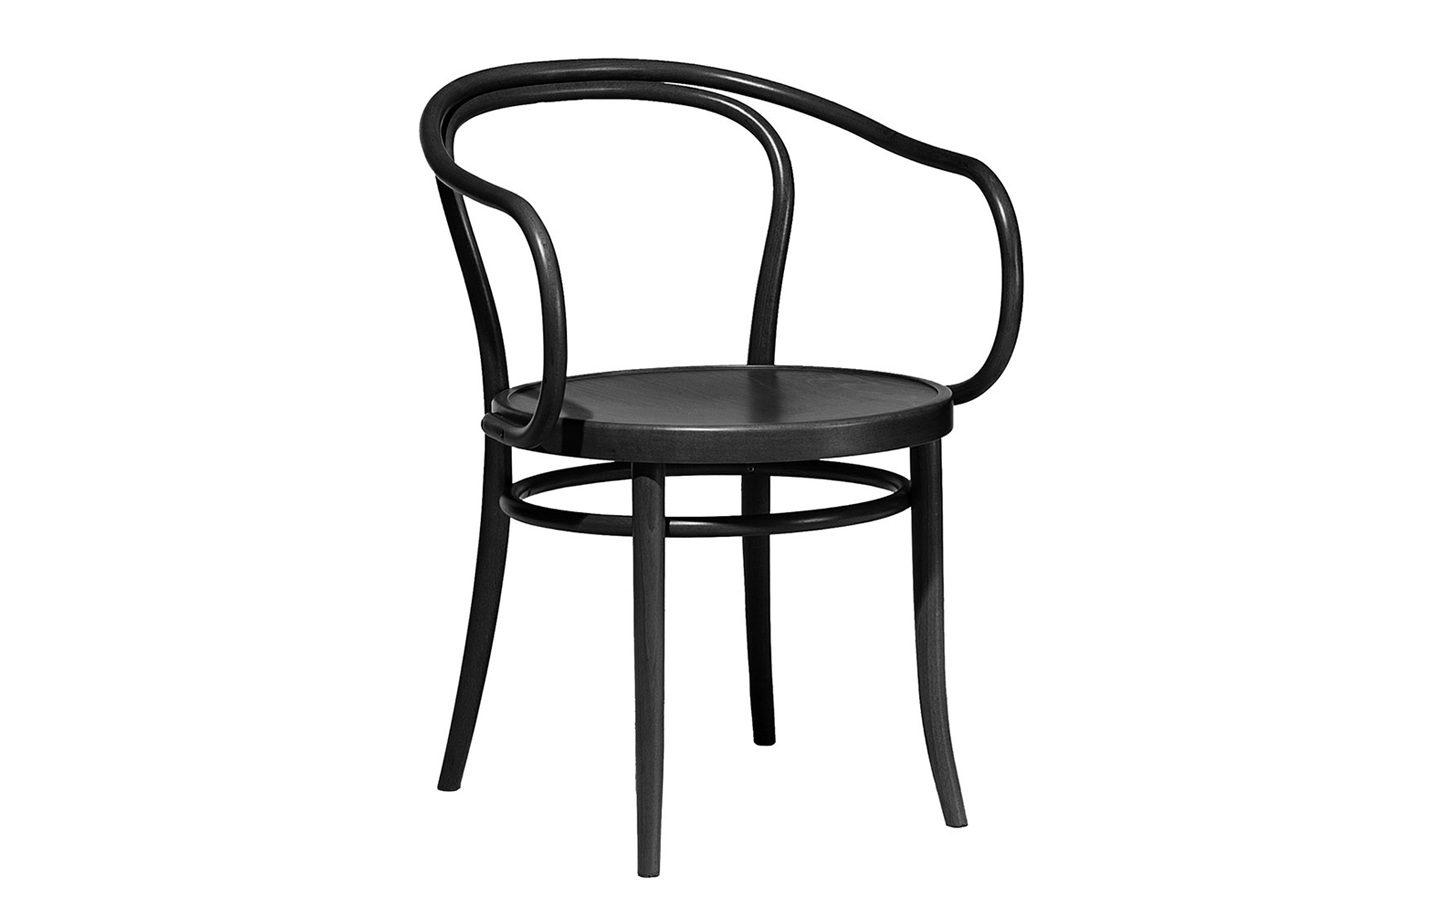 30-Chair-Bent-Wood-Black-Ton-06